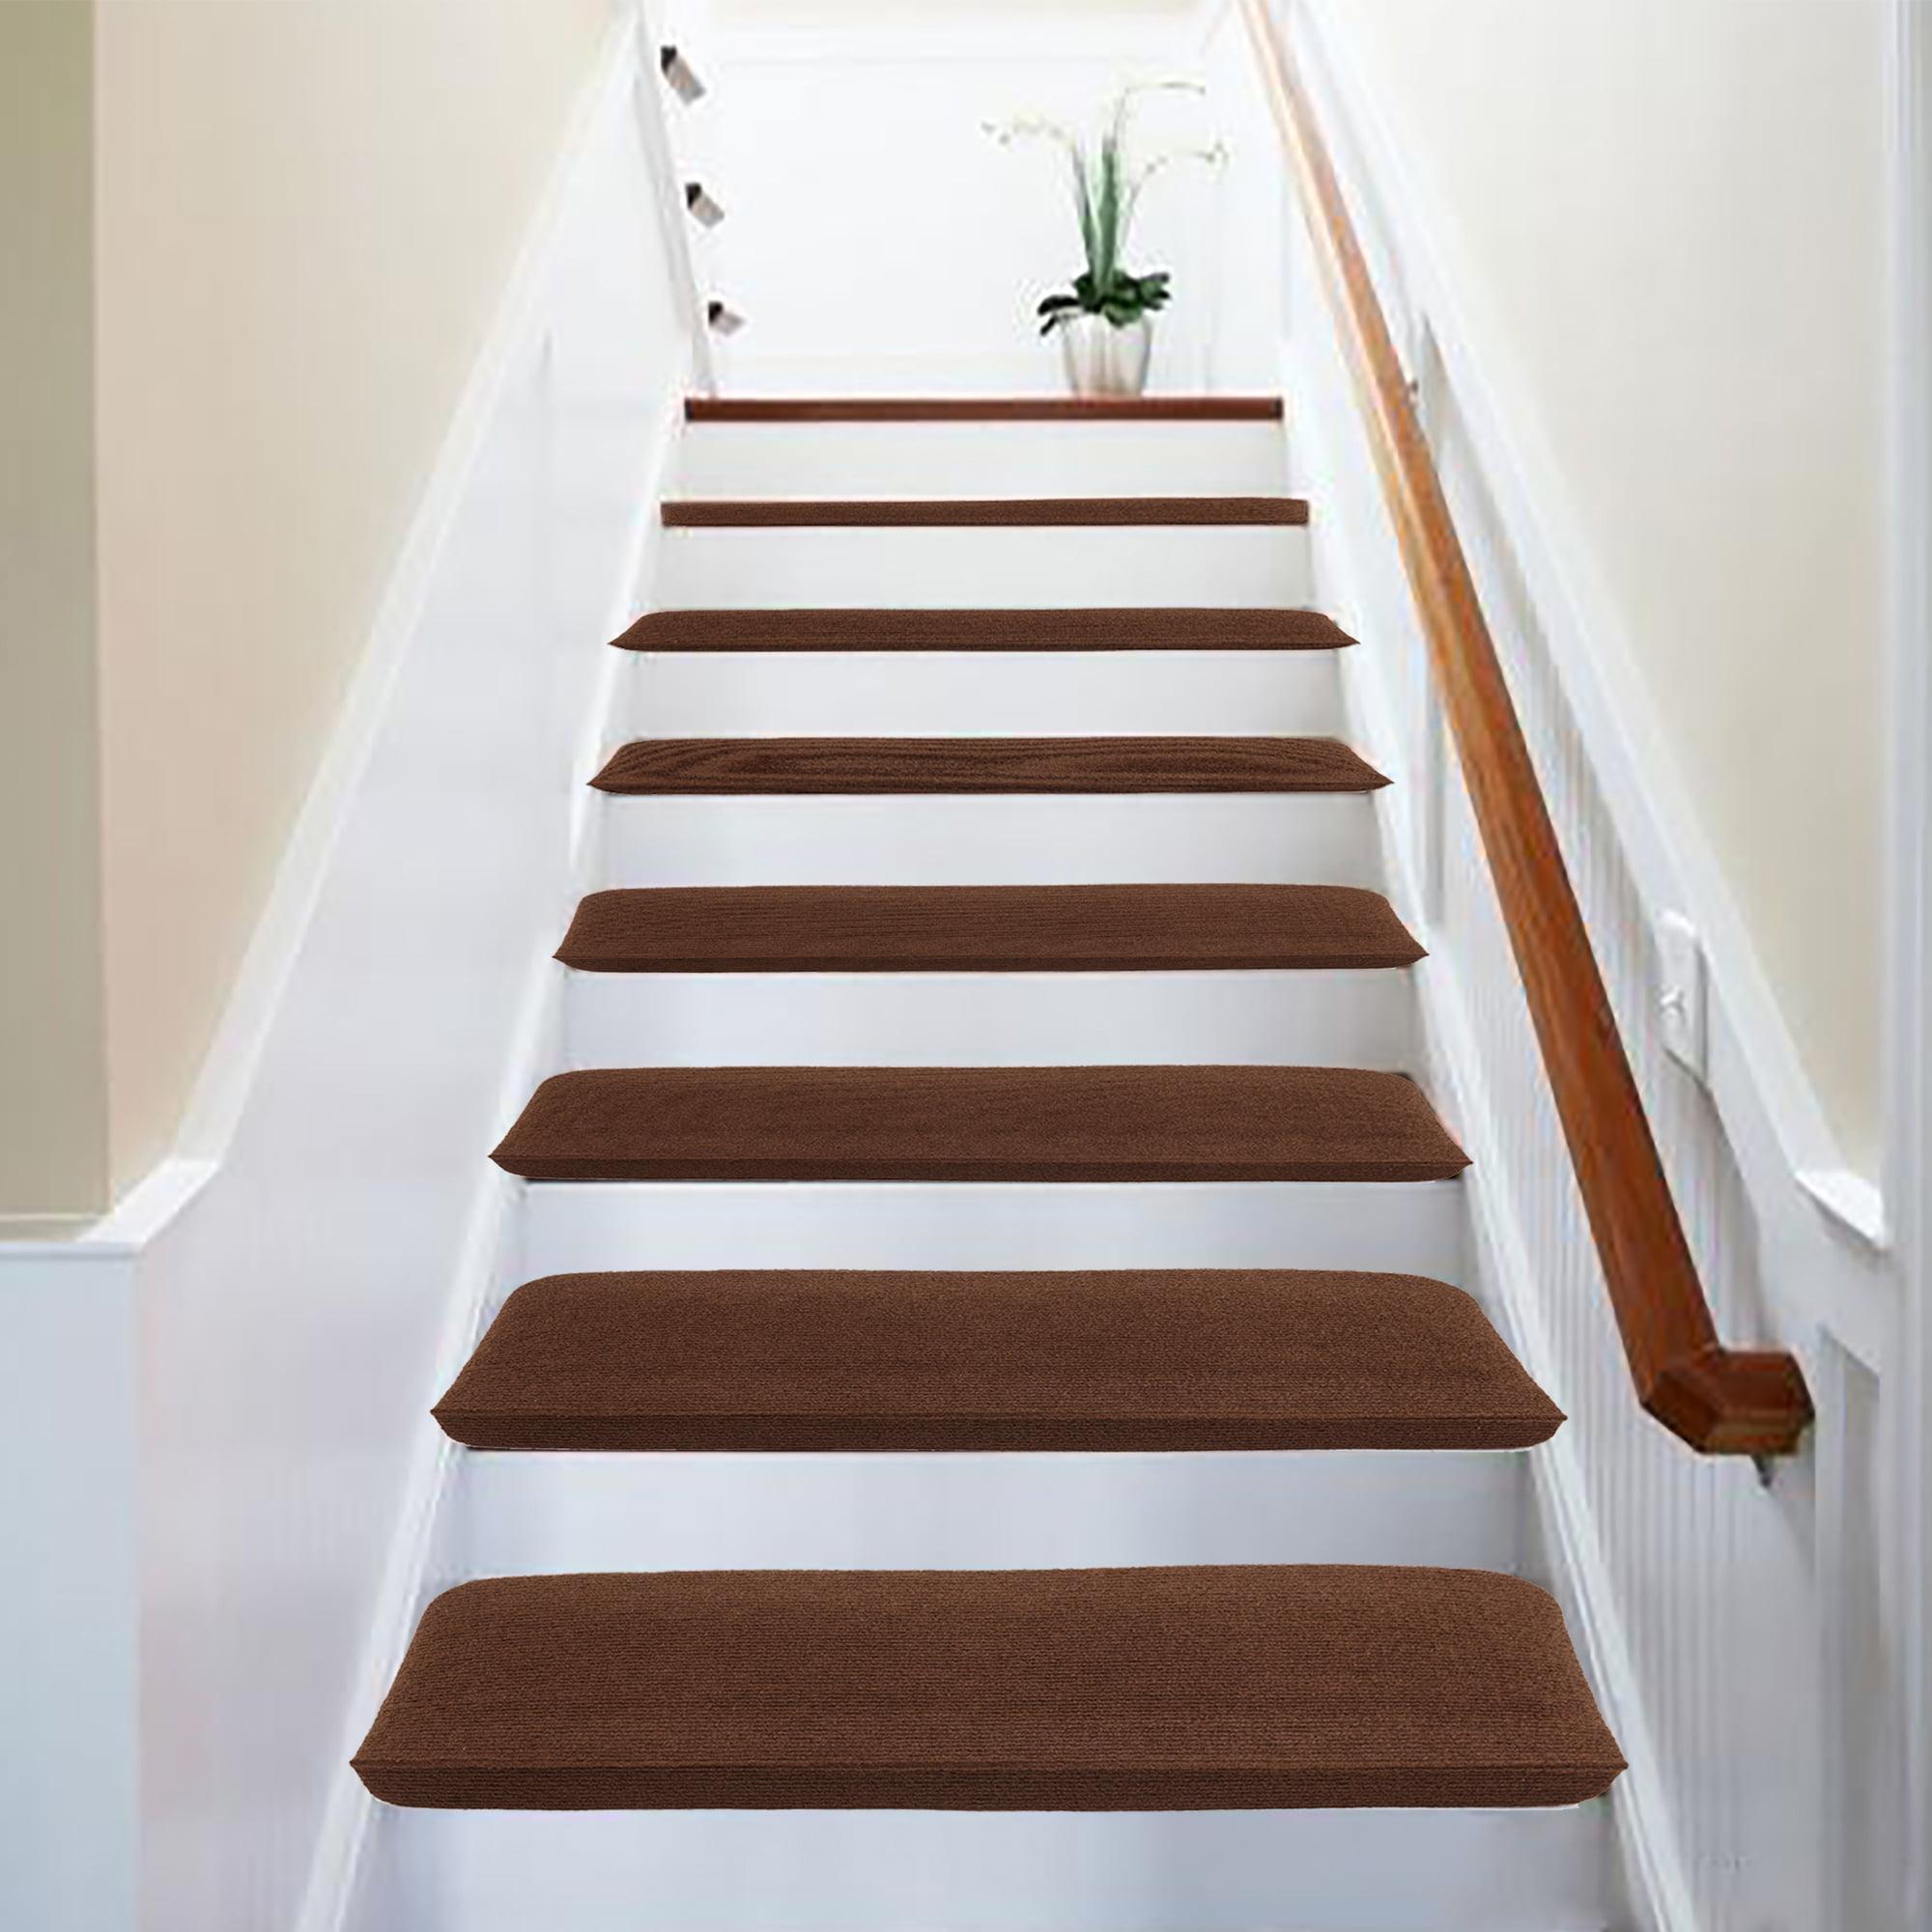 Carpet step protectors mop bucket sams